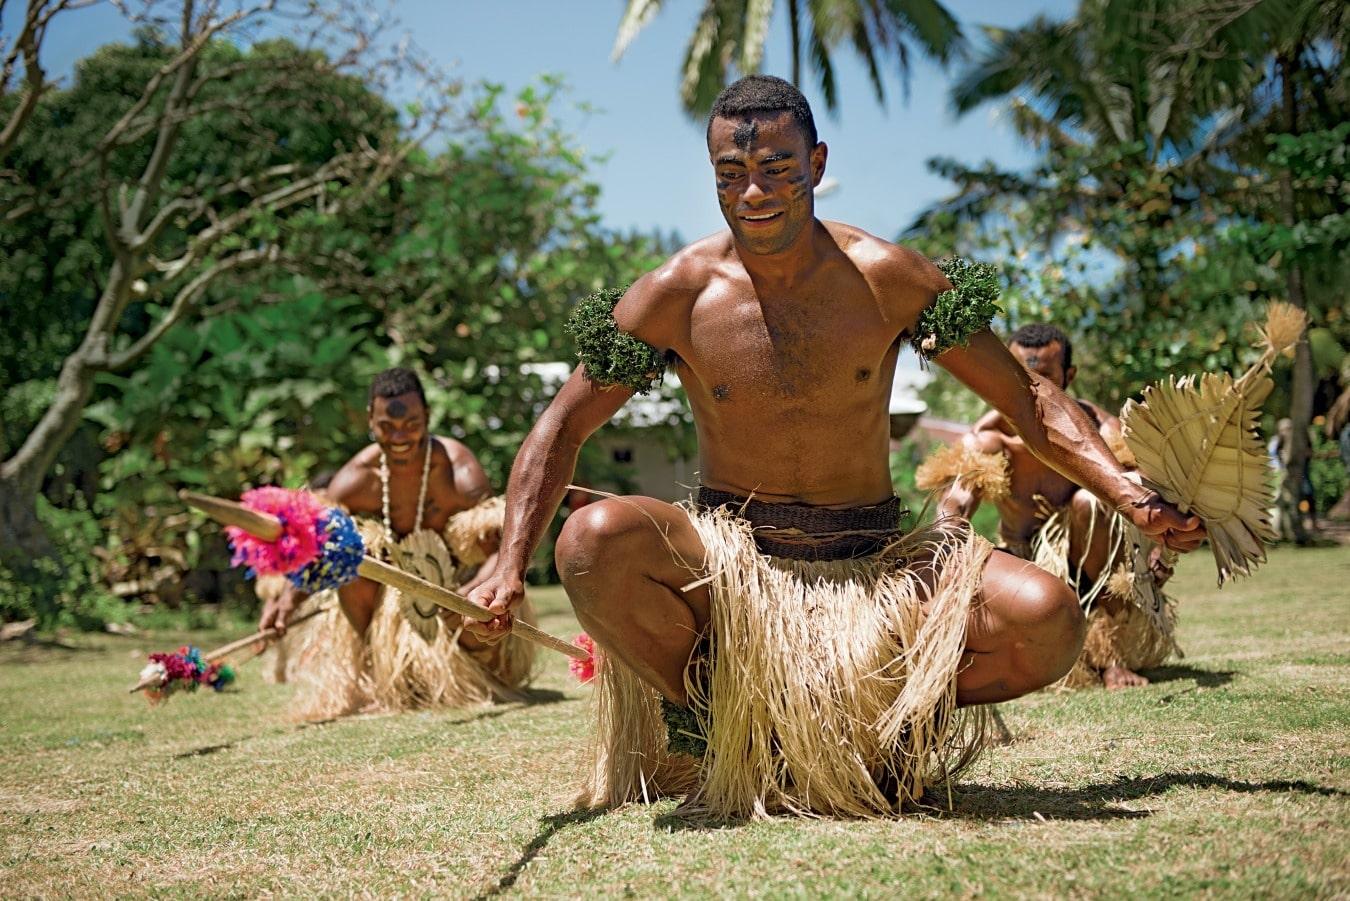 Fiji Dancer © Paul Gauguin Cruises